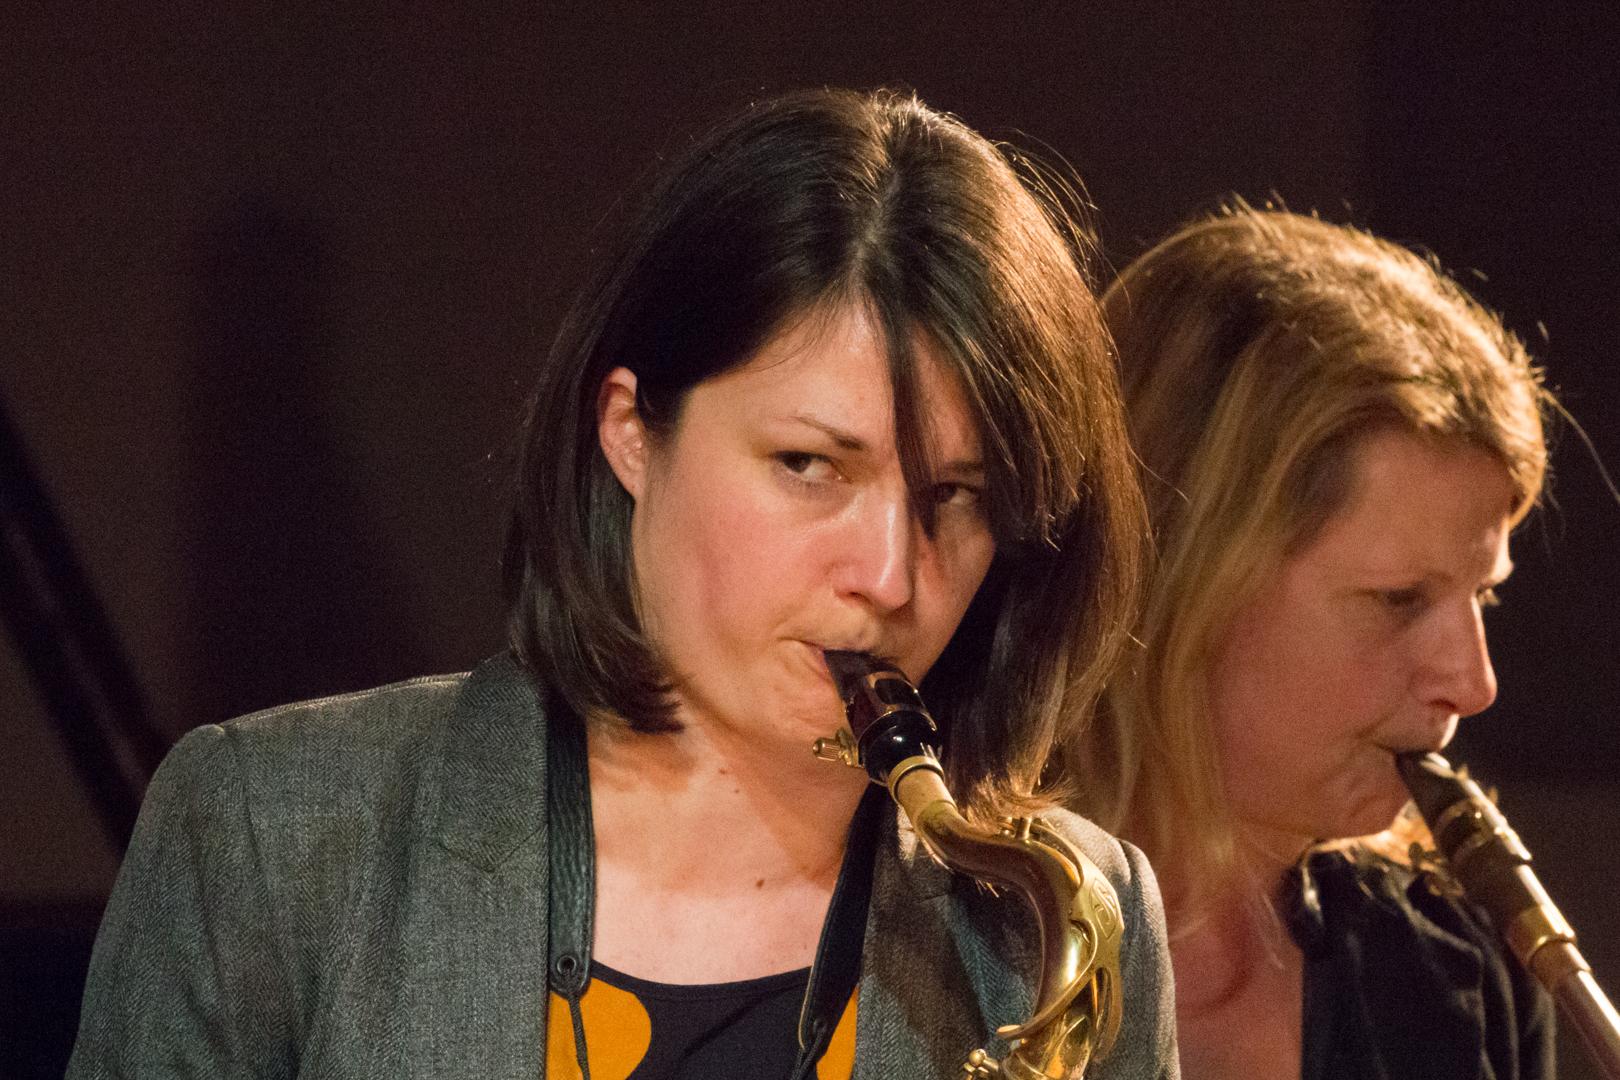 Trish Clowes and Karen Sharp performing in the Nikki Iles All Star Septet at Fleet Jazz on 19th Feb 2019.